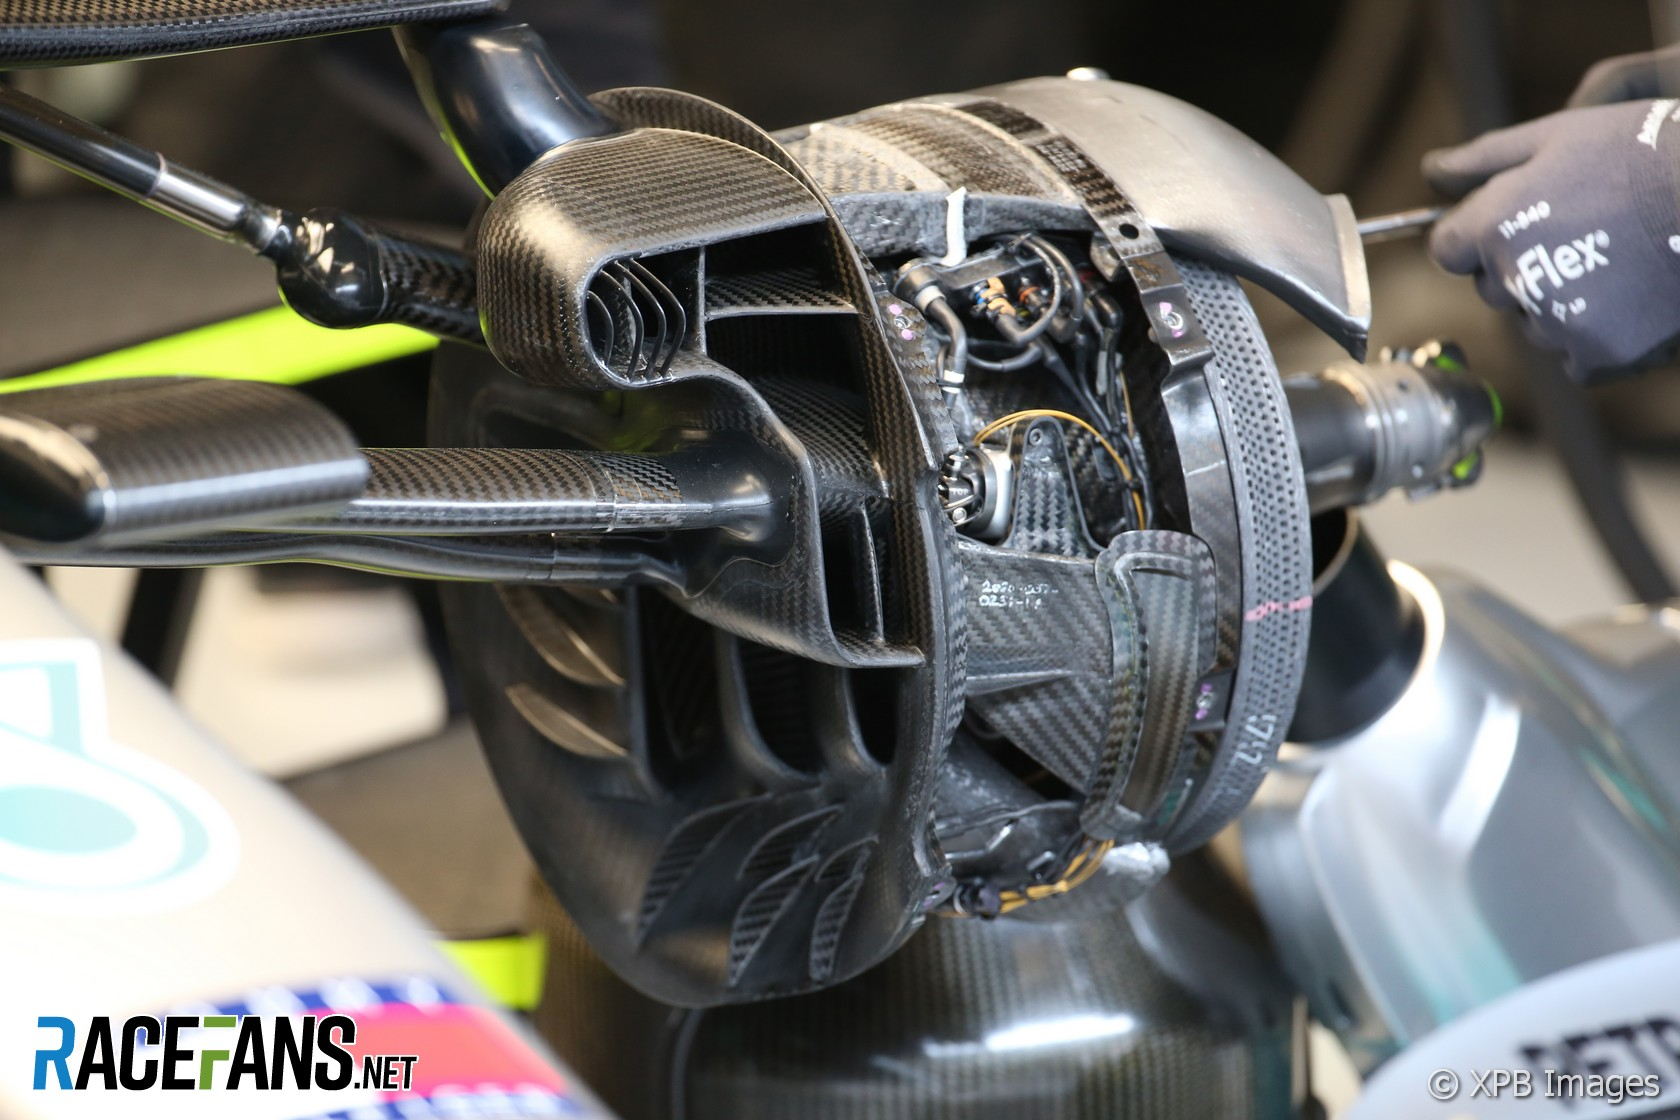 Mercedes W11 brake duct, Circuit de Catalunya, 2020